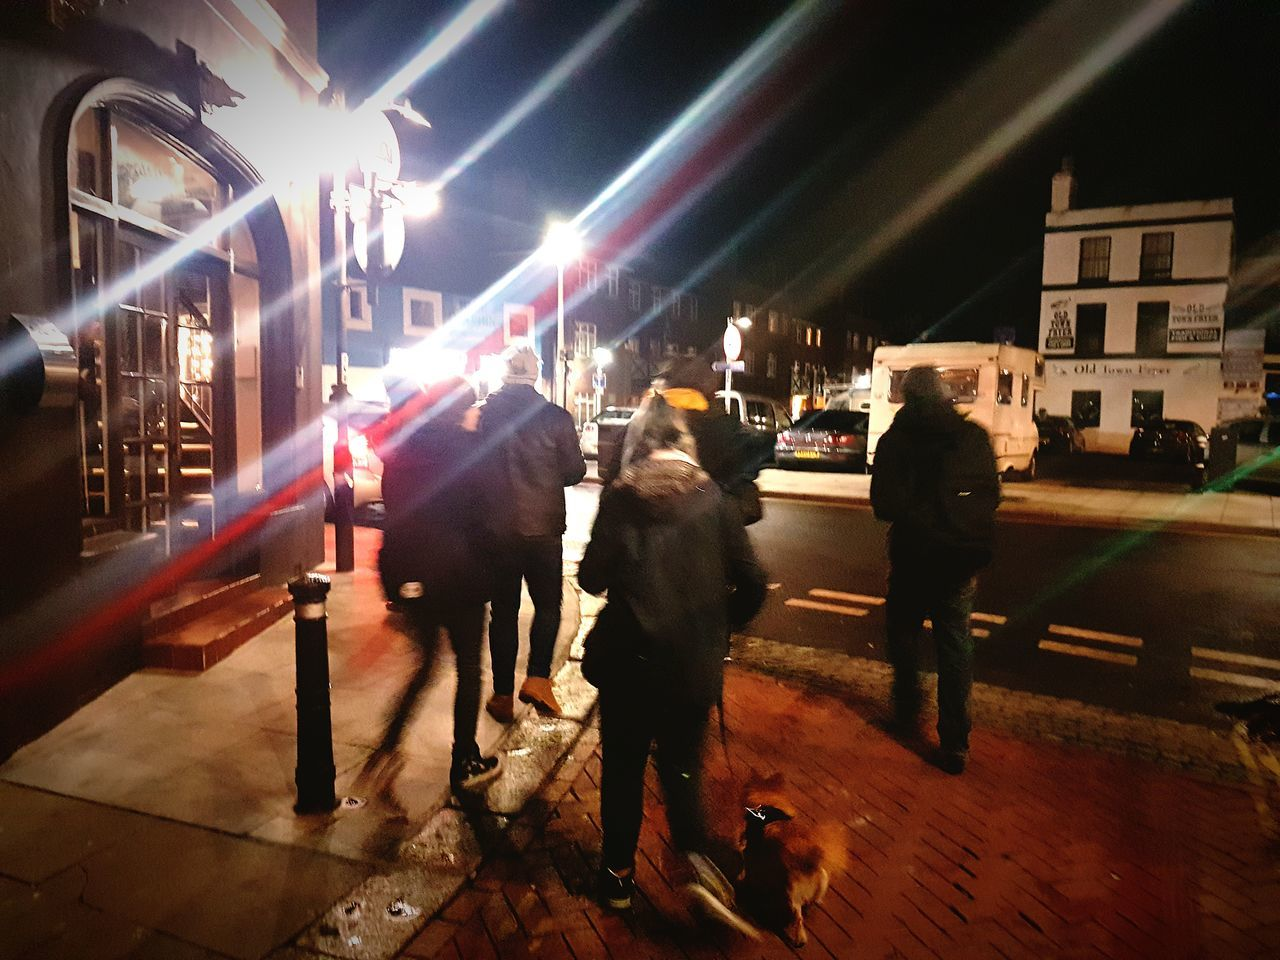 Night People Outdoors